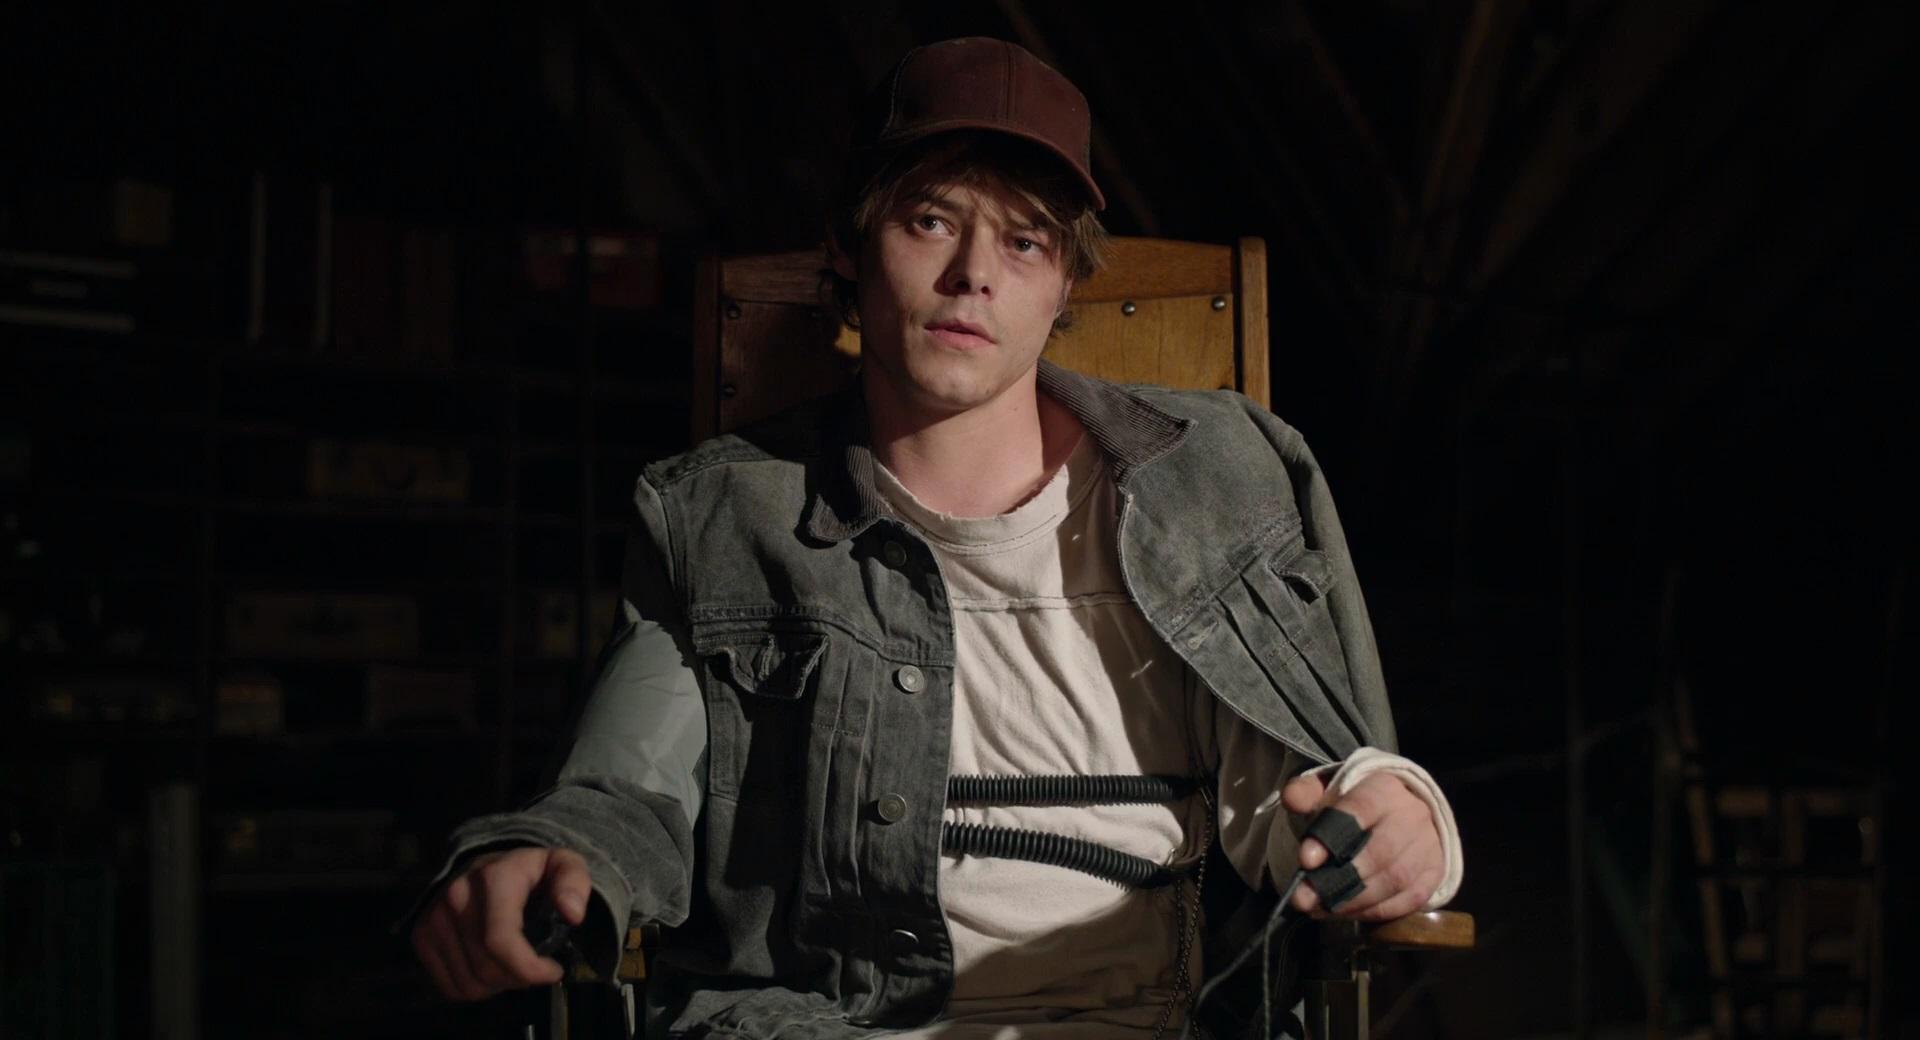 Yeni Mutantlar | The New Mutants | 2020 | BDRip | XviD | Türkçe Dublaj | 4K - 1080p - m720p - m1080p | BluRay | Dual | TR-EN | Tek Link